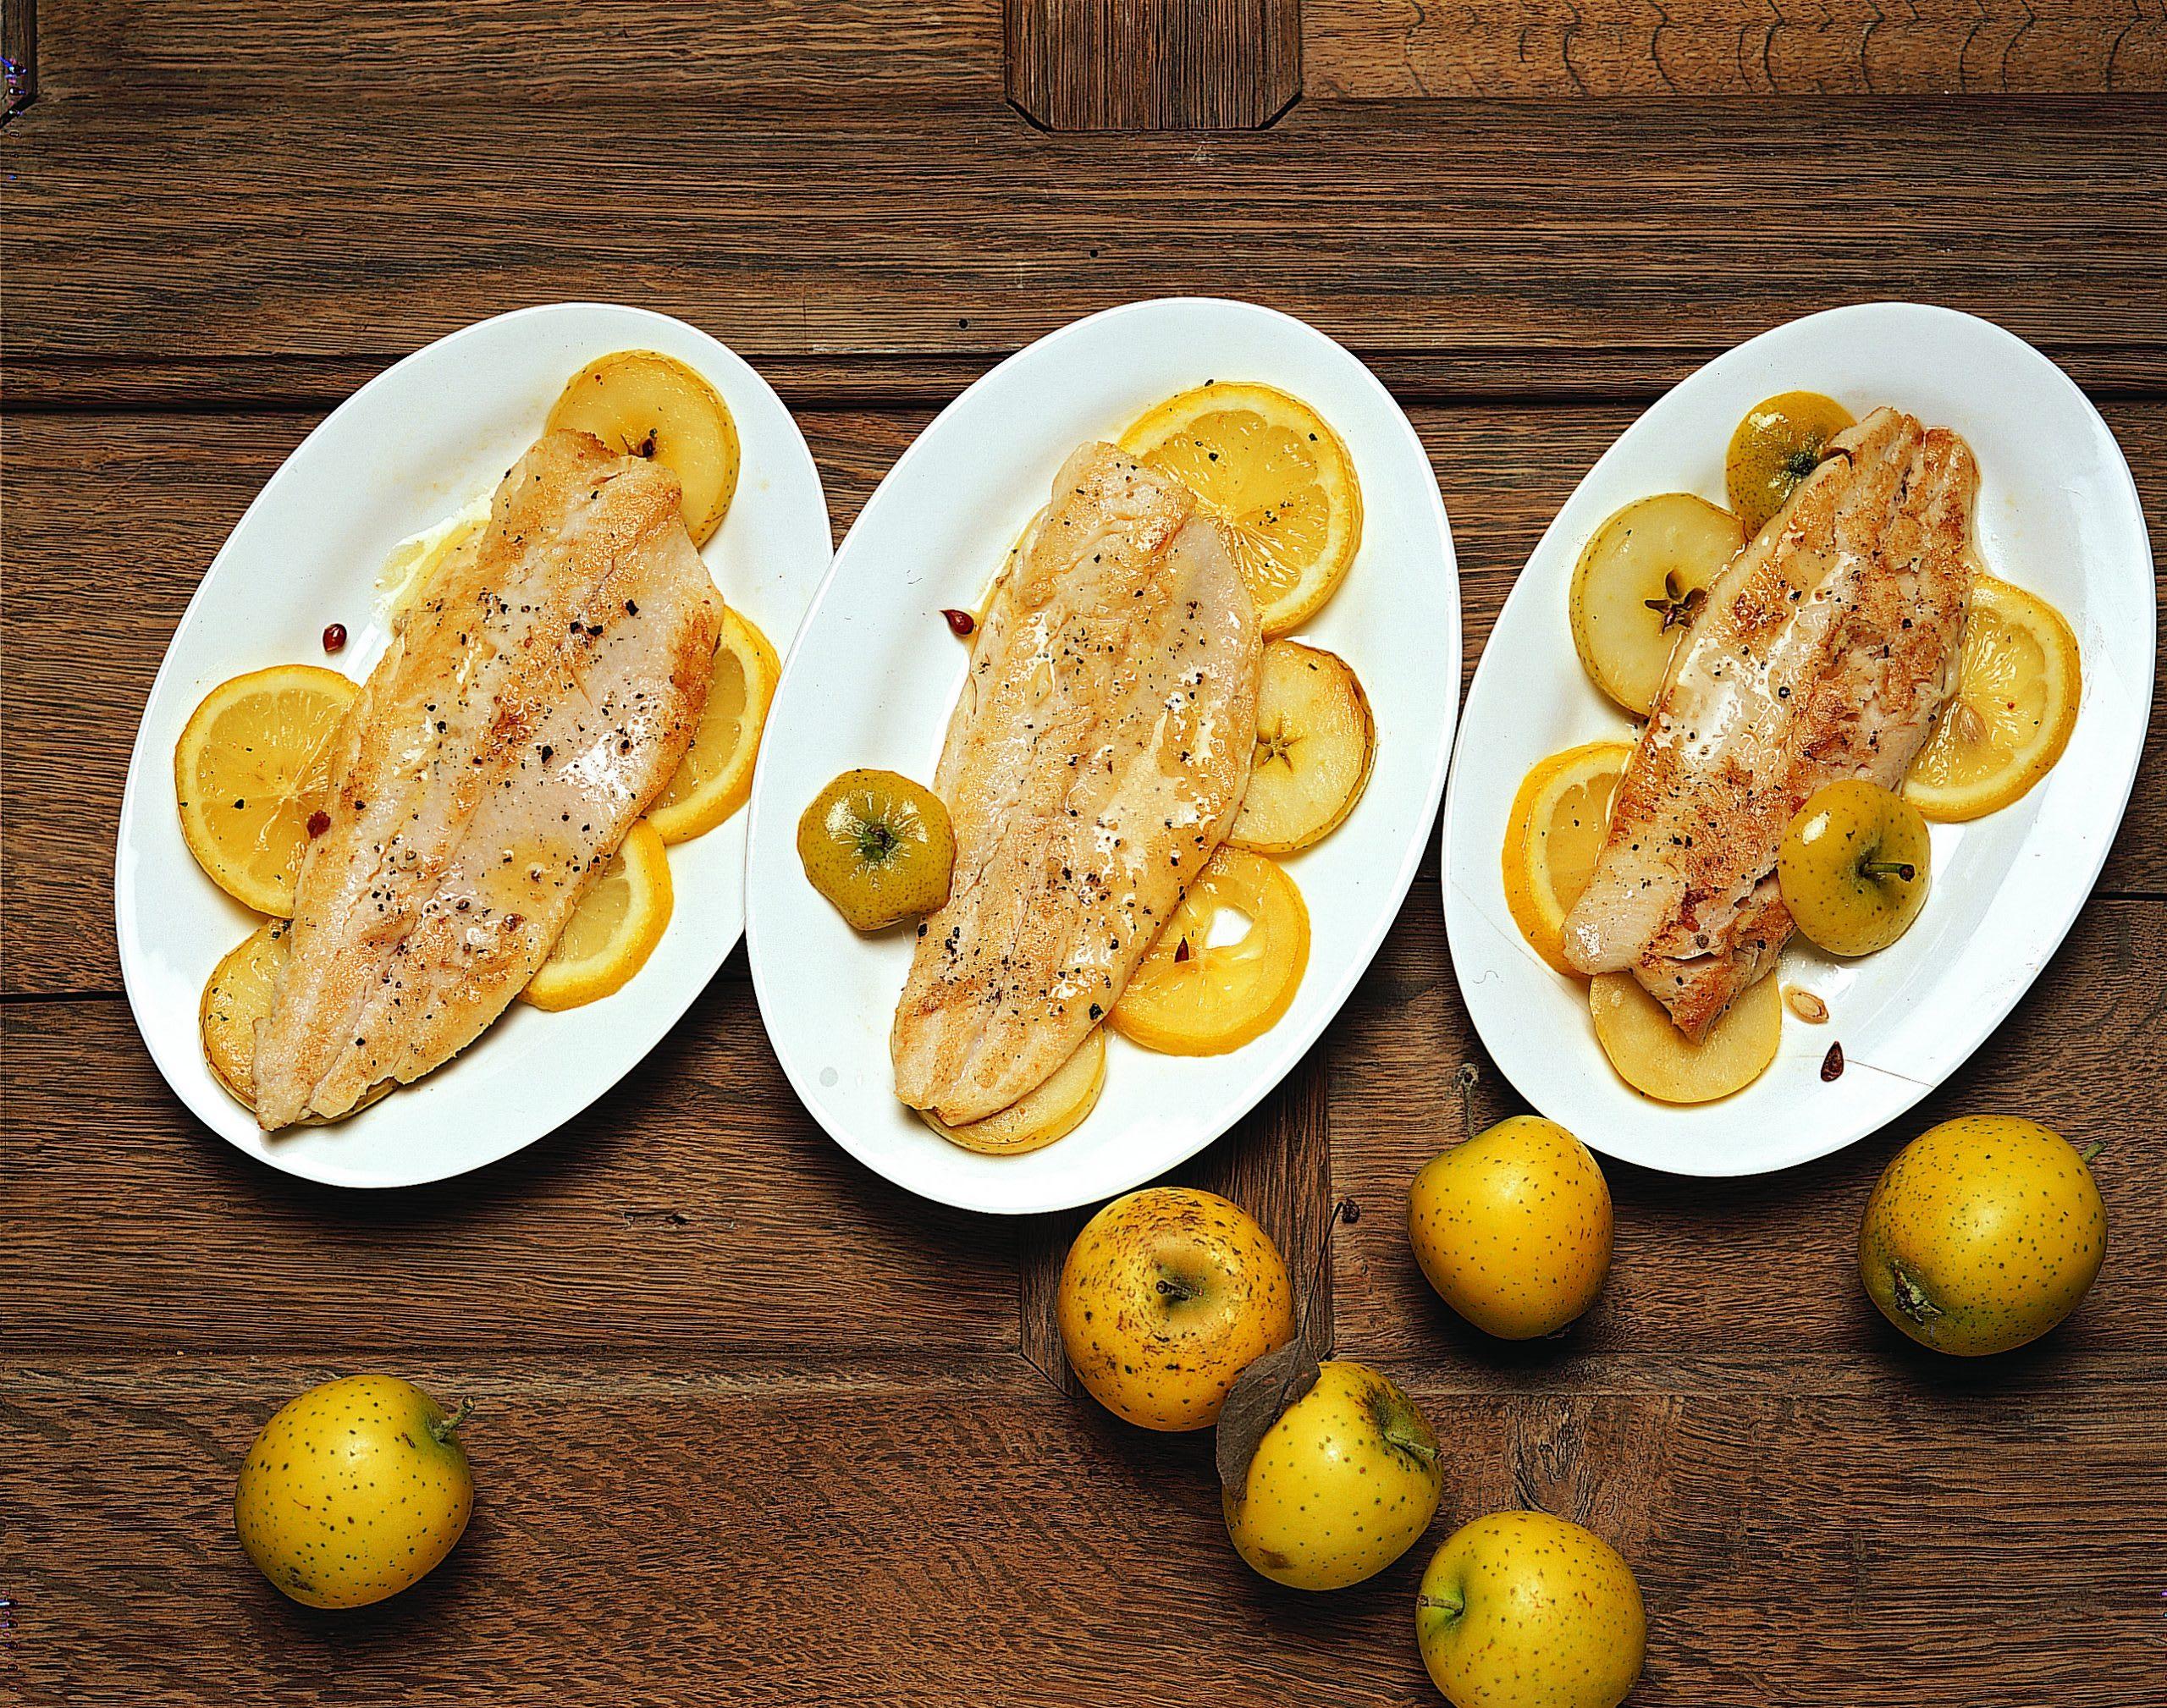 Apfel-Zitronen-Ringe mit Forellenfilets